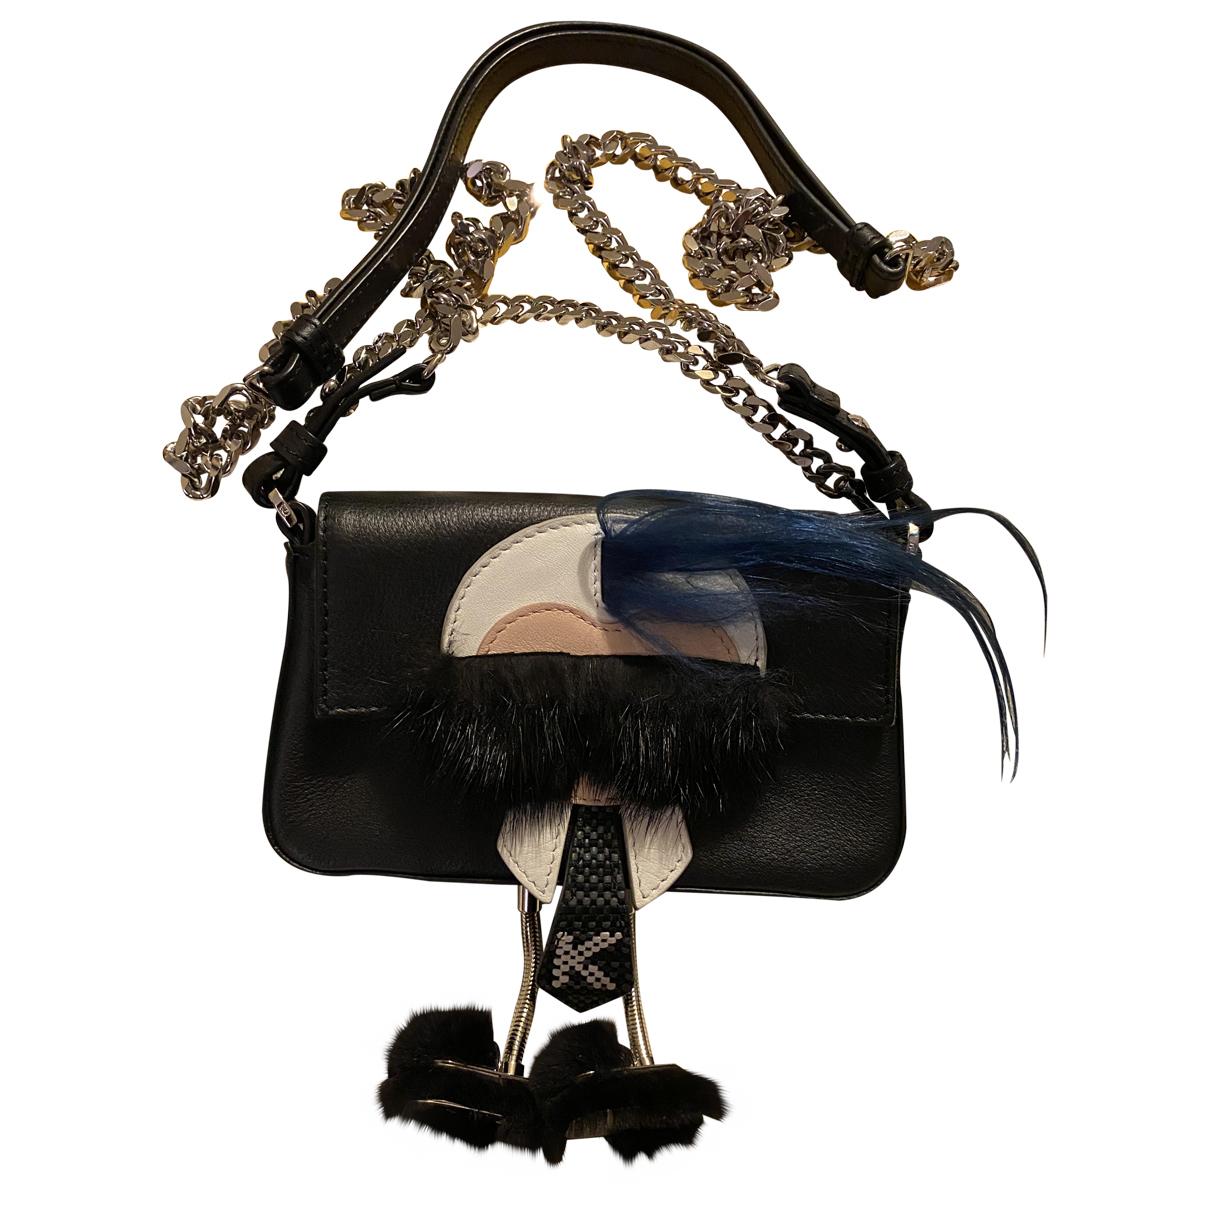 Fendi Baguette Black Leather Clutch bag for Women N